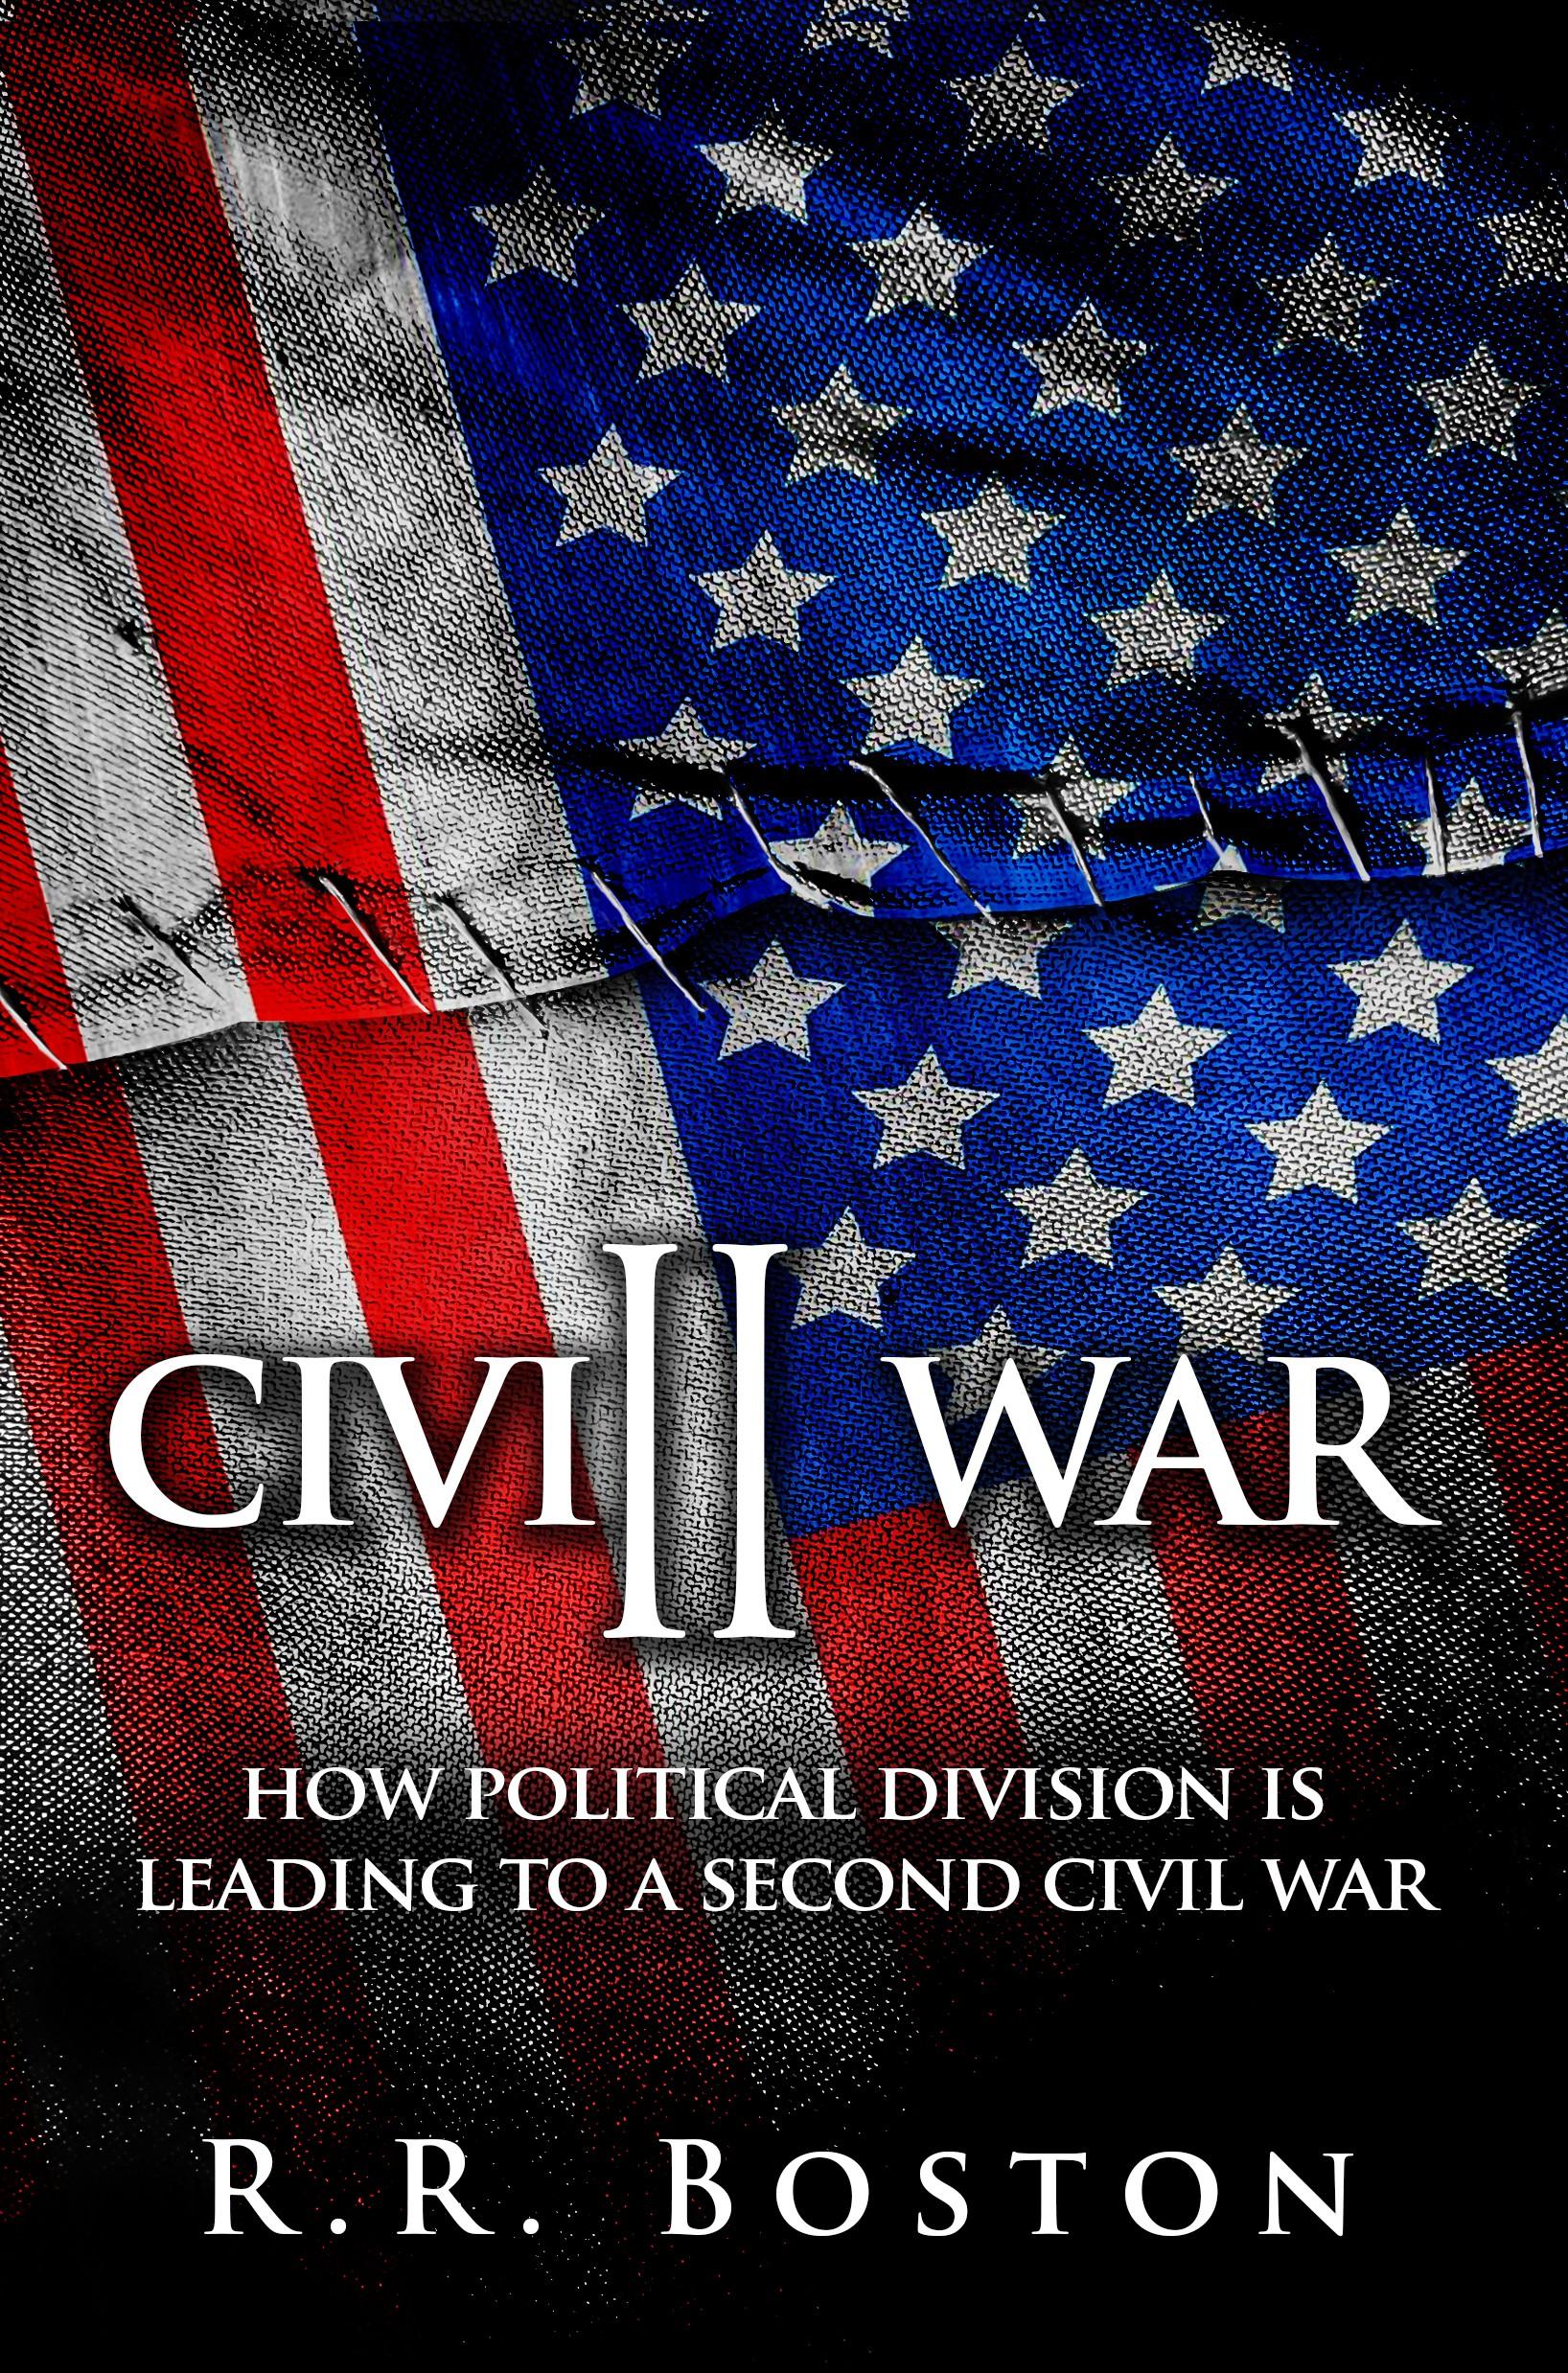 Veteran needing patriotic design for new book